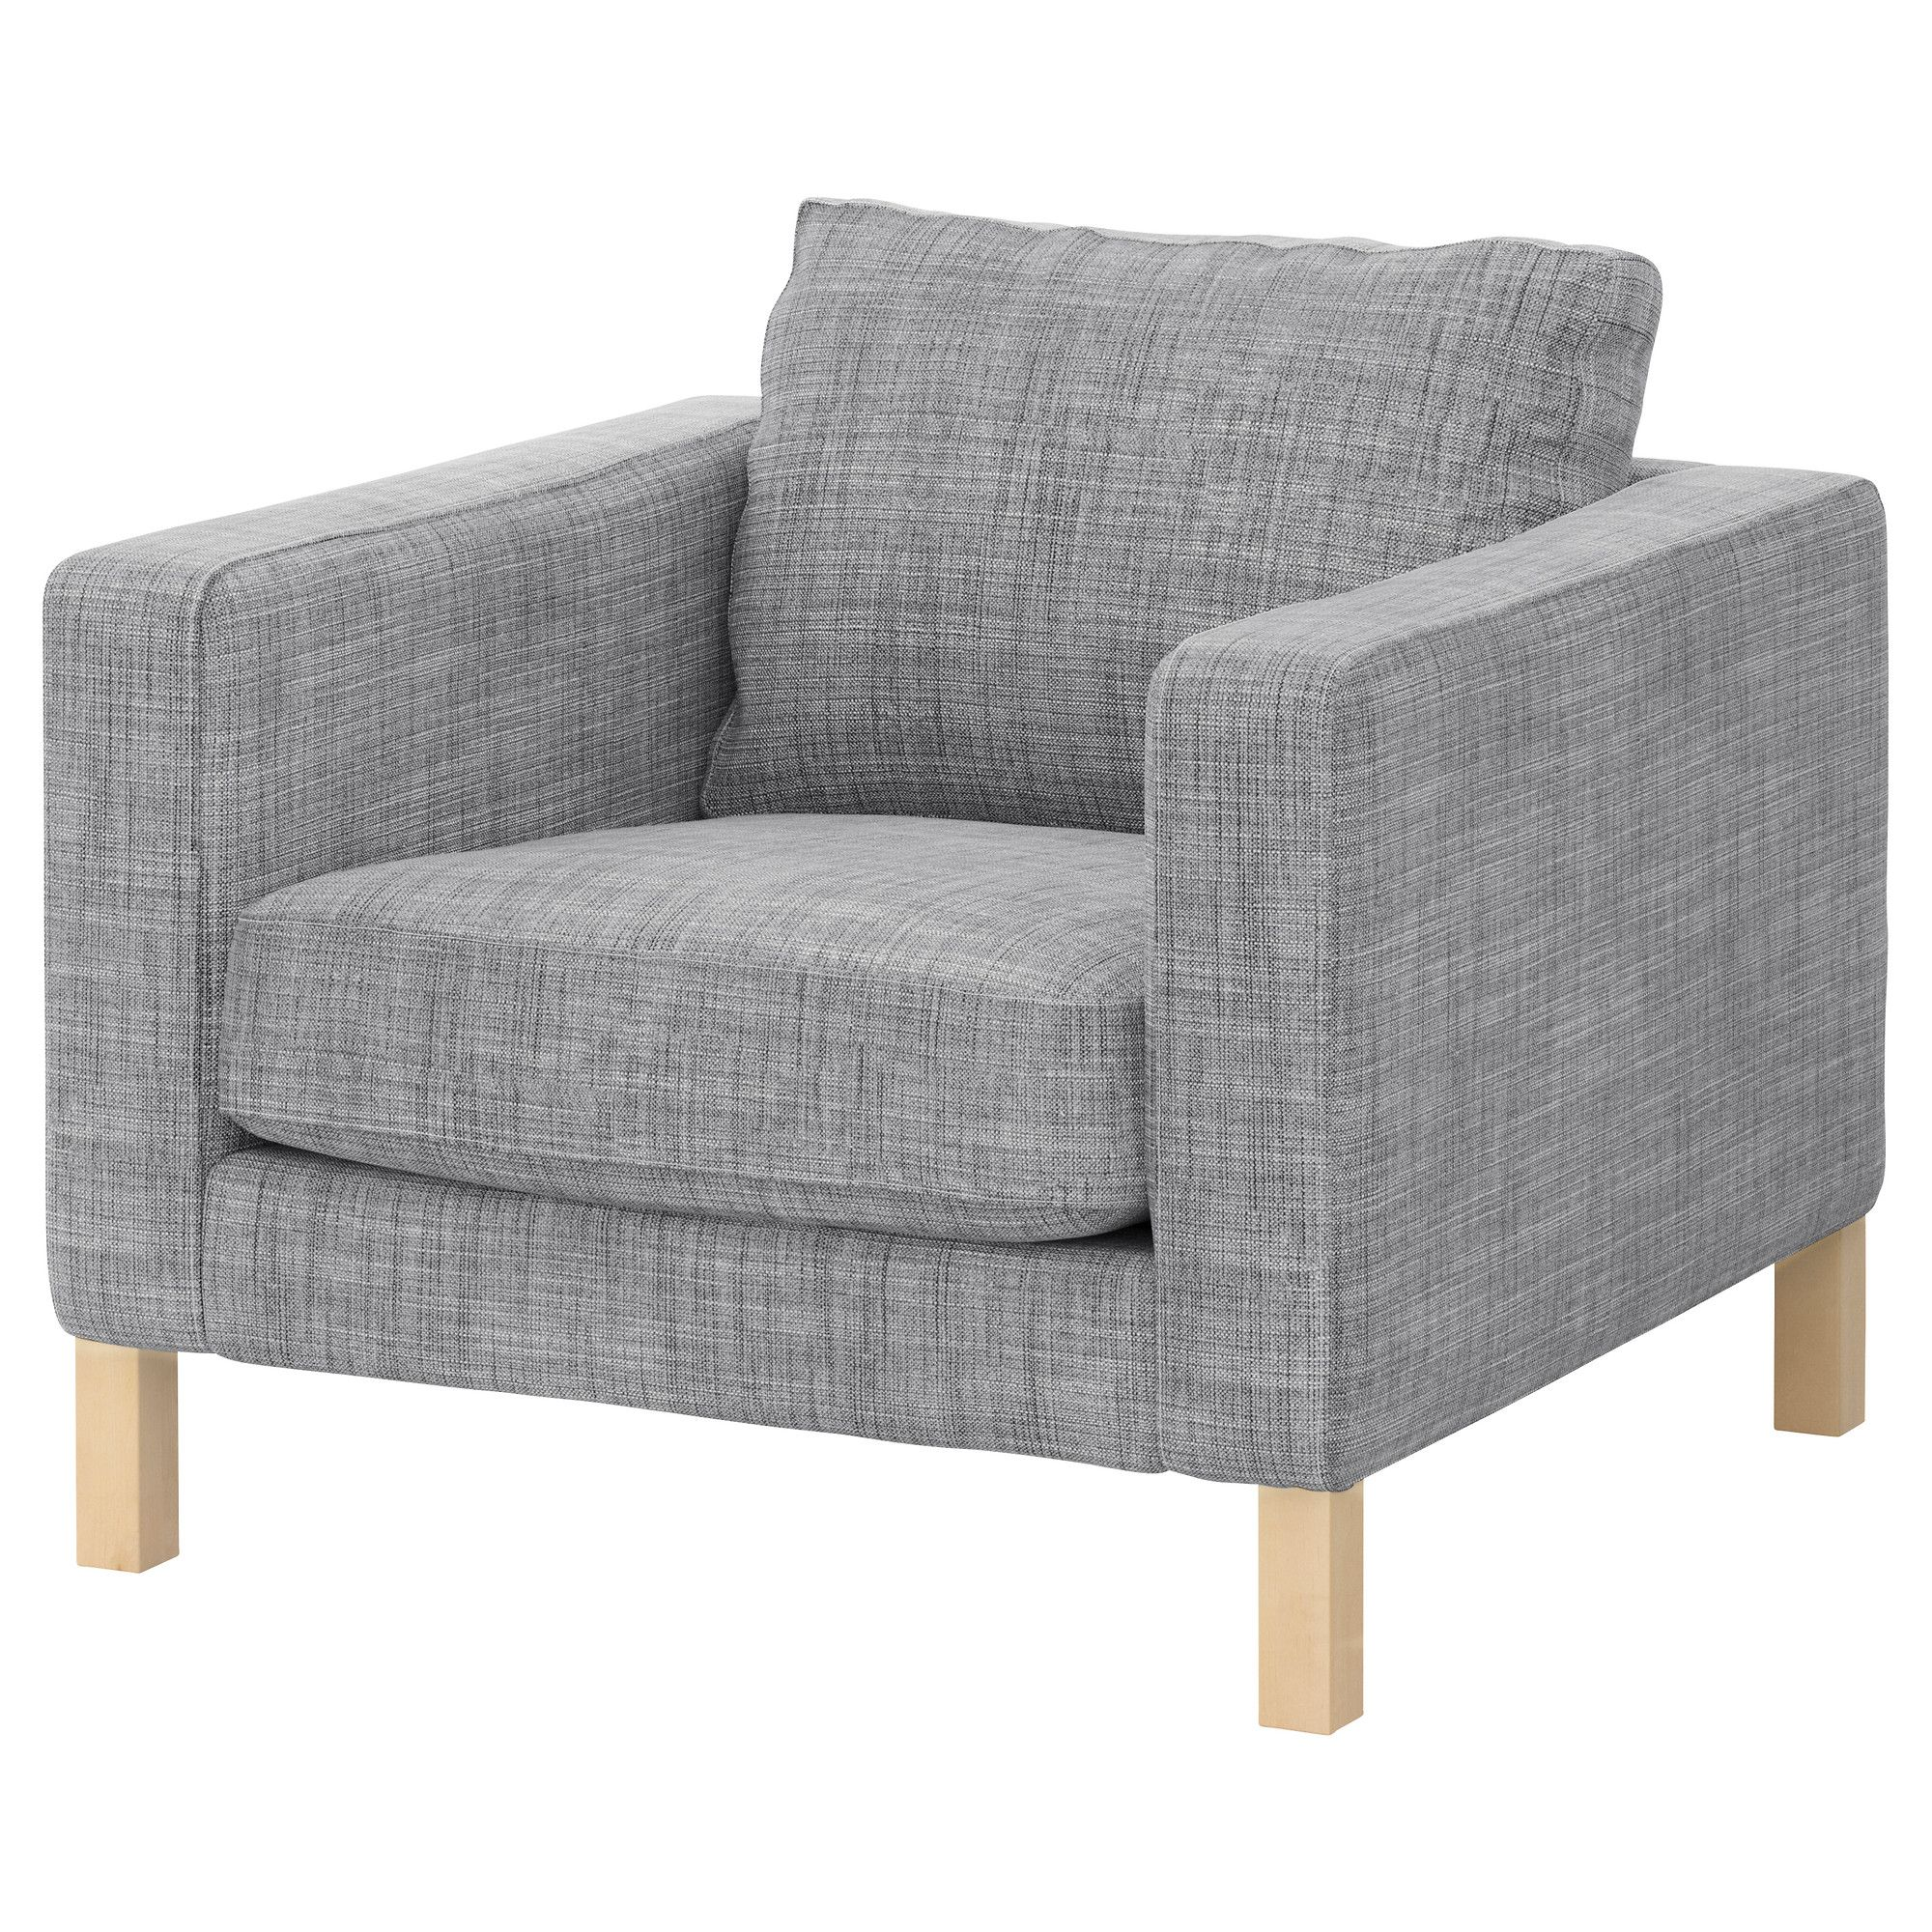 Karlstad Chair Cover Isunda Gray Hammock Stand Used Ikea Home Pinterest